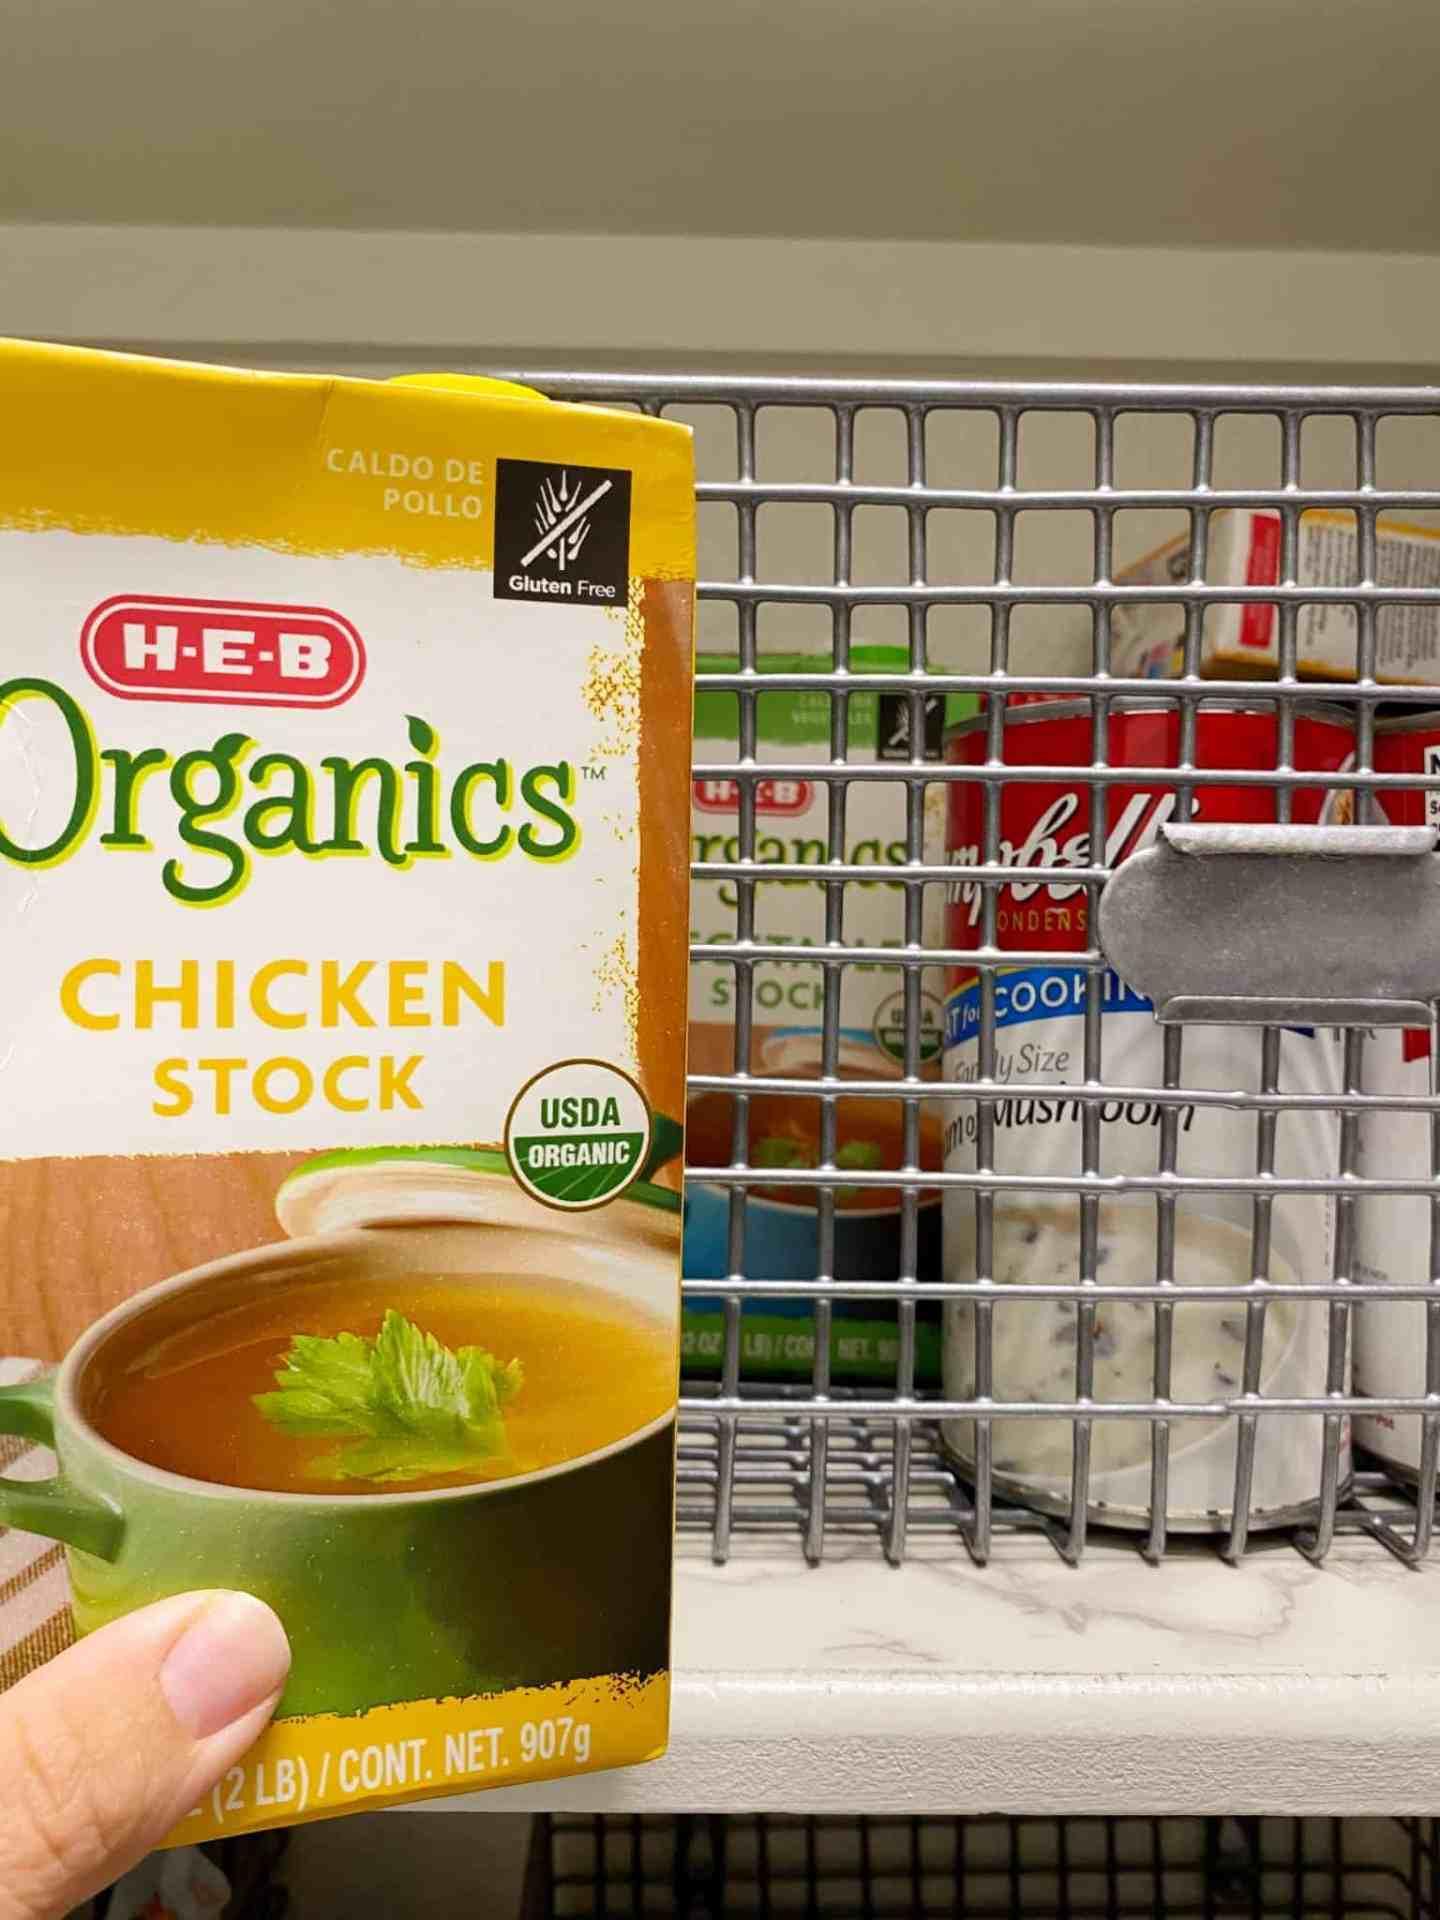 chicken-stock-and-cream-of-mushroom